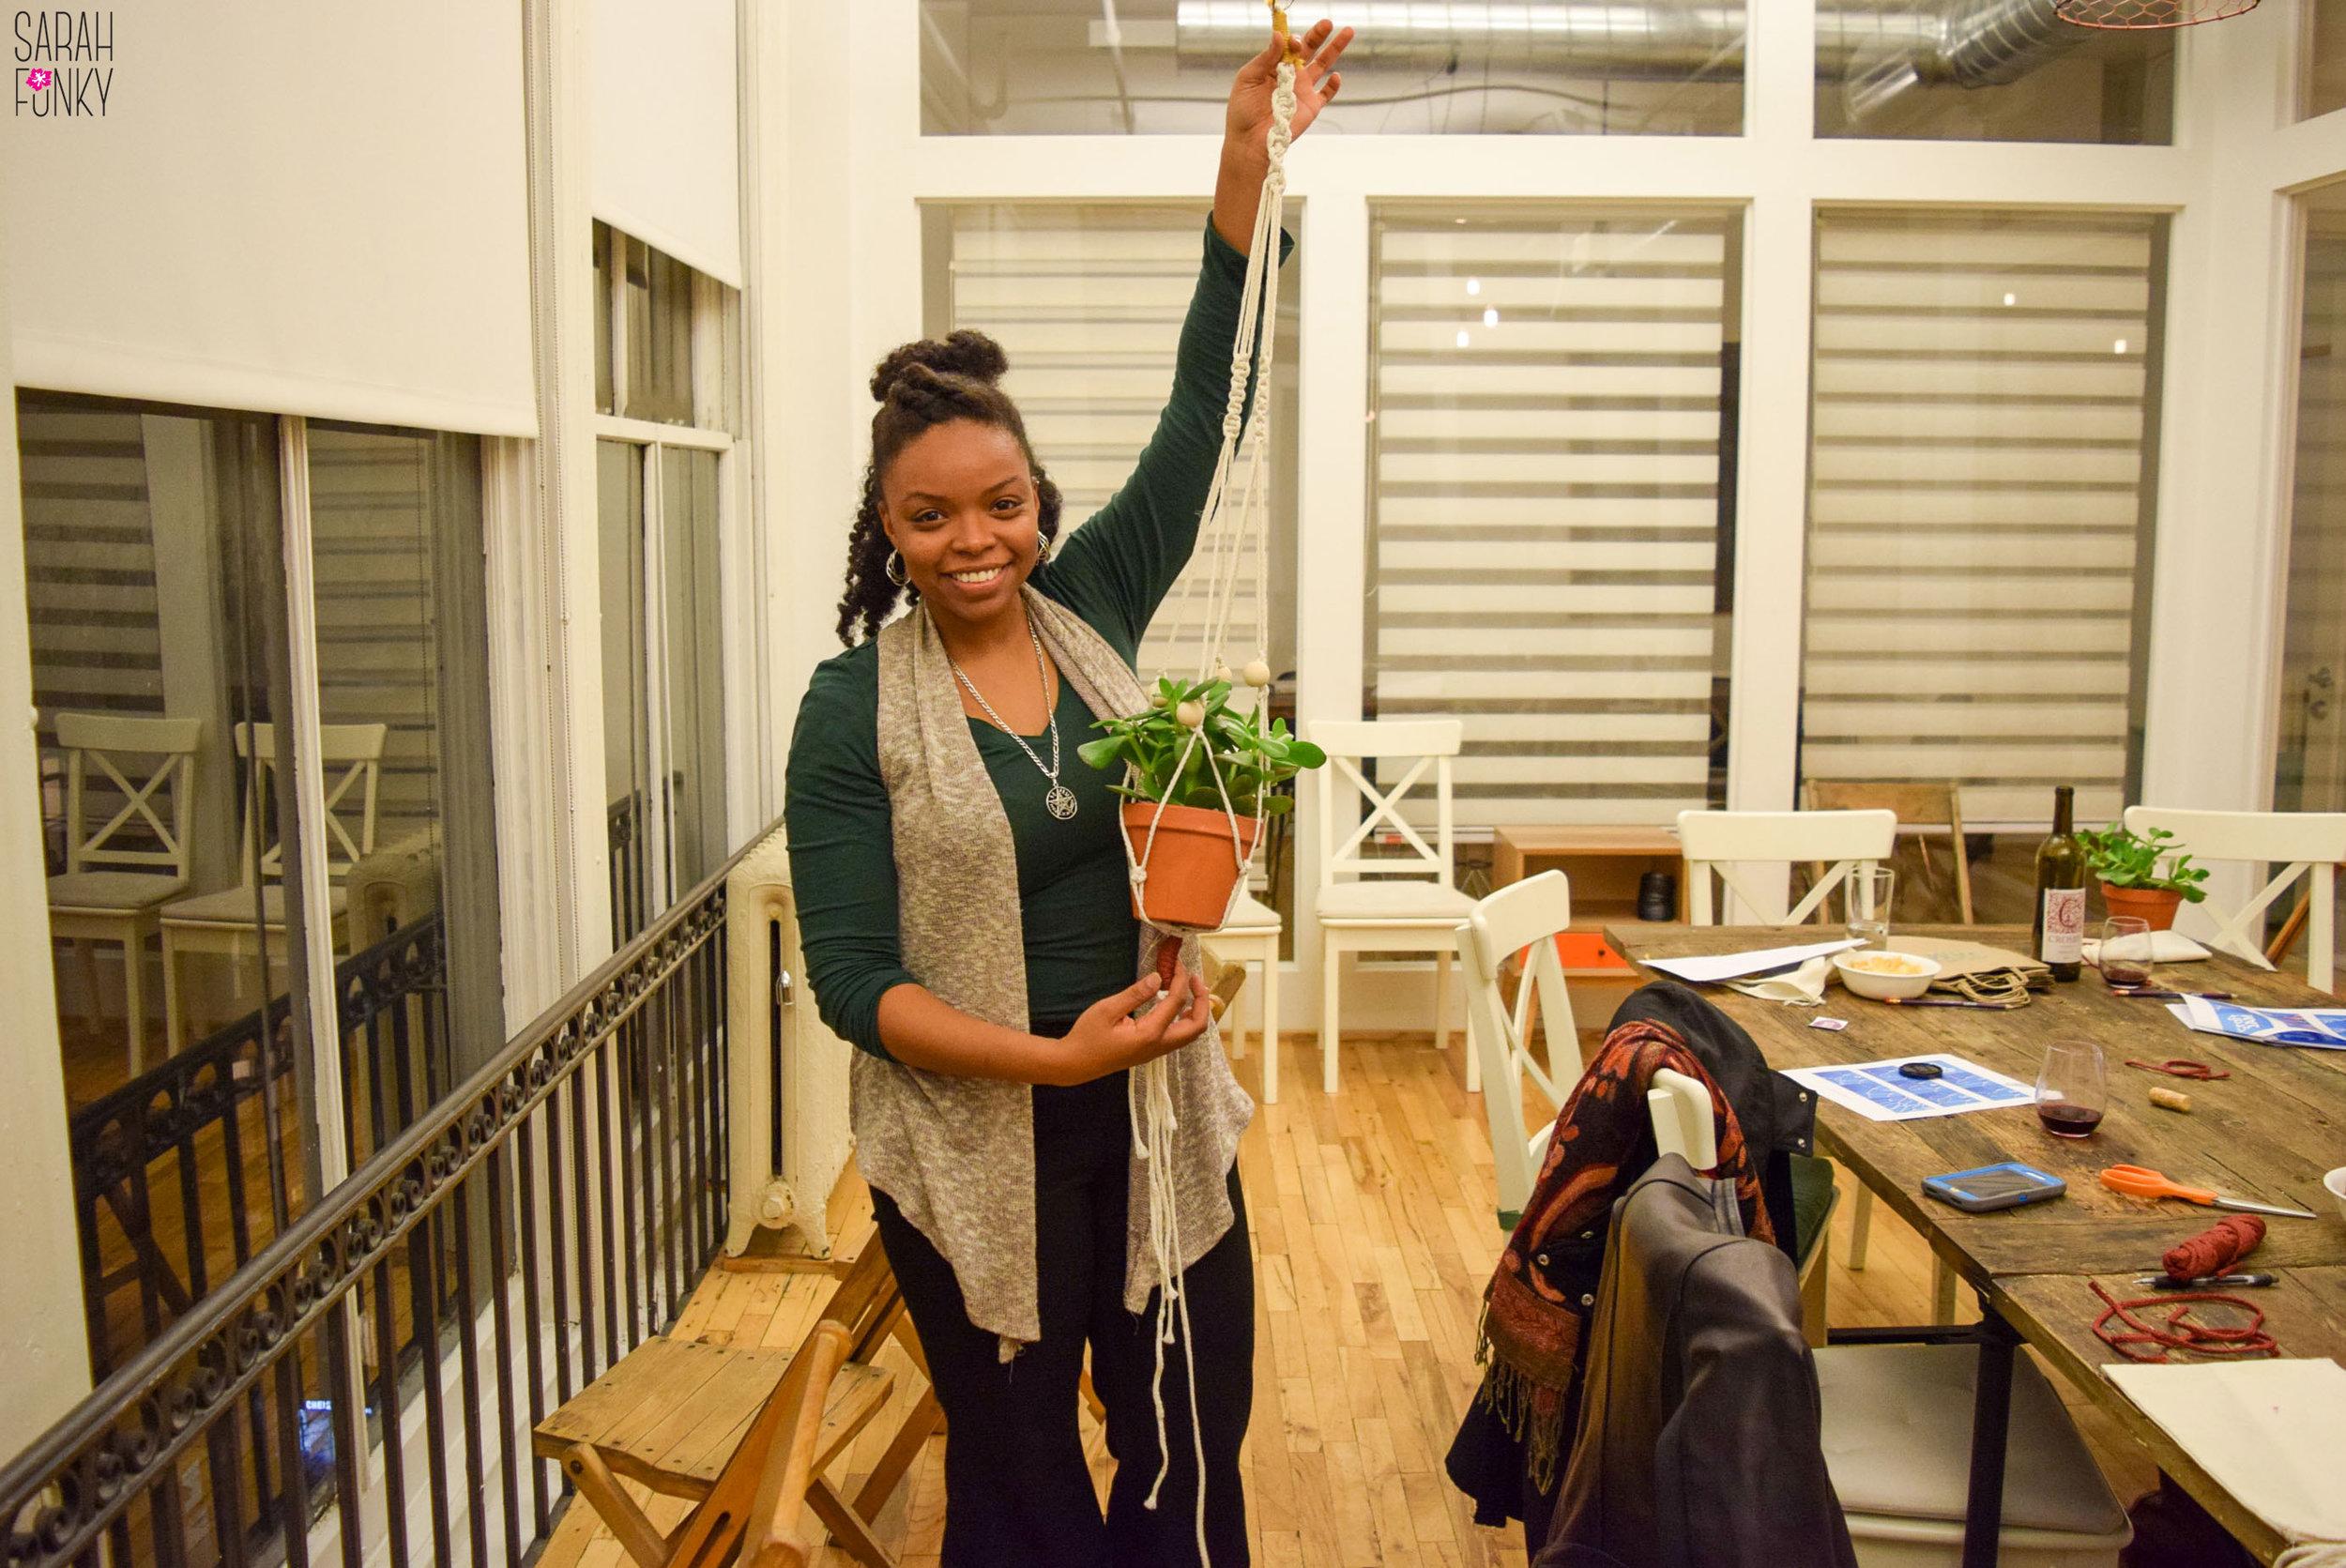 Danielle Desir A New Proud Plant Mom!